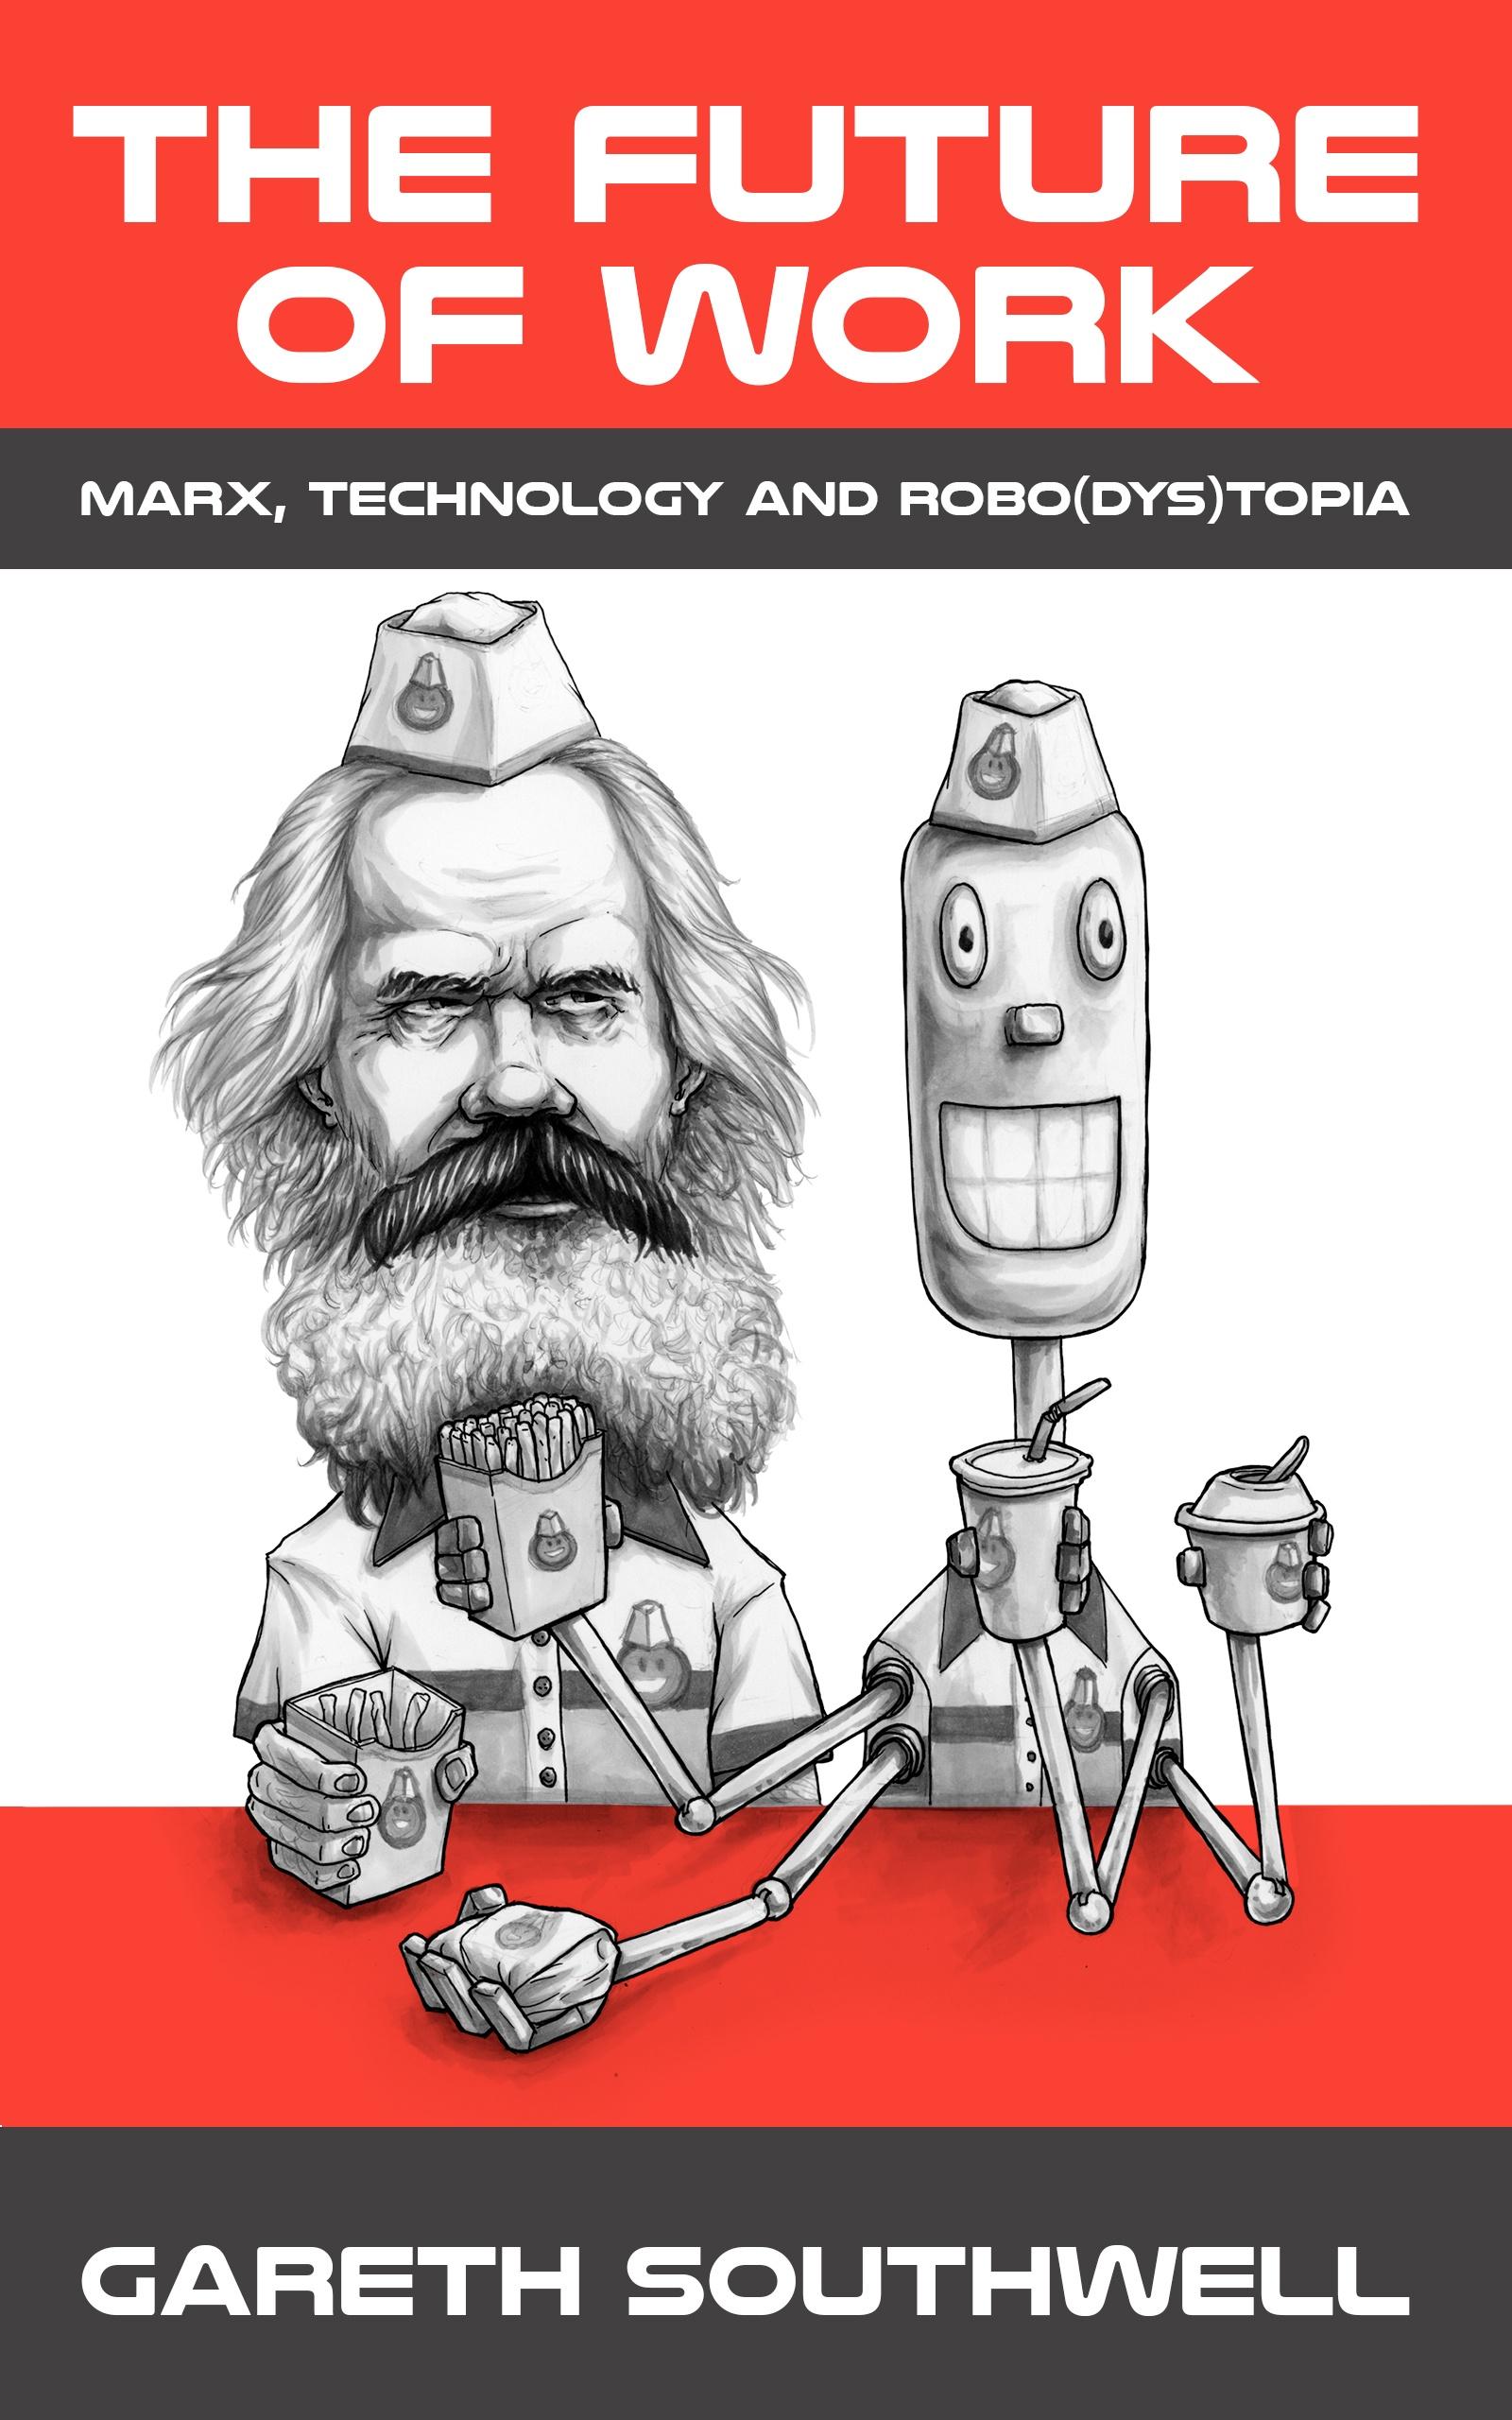 Future-of-Work-cover.jpg